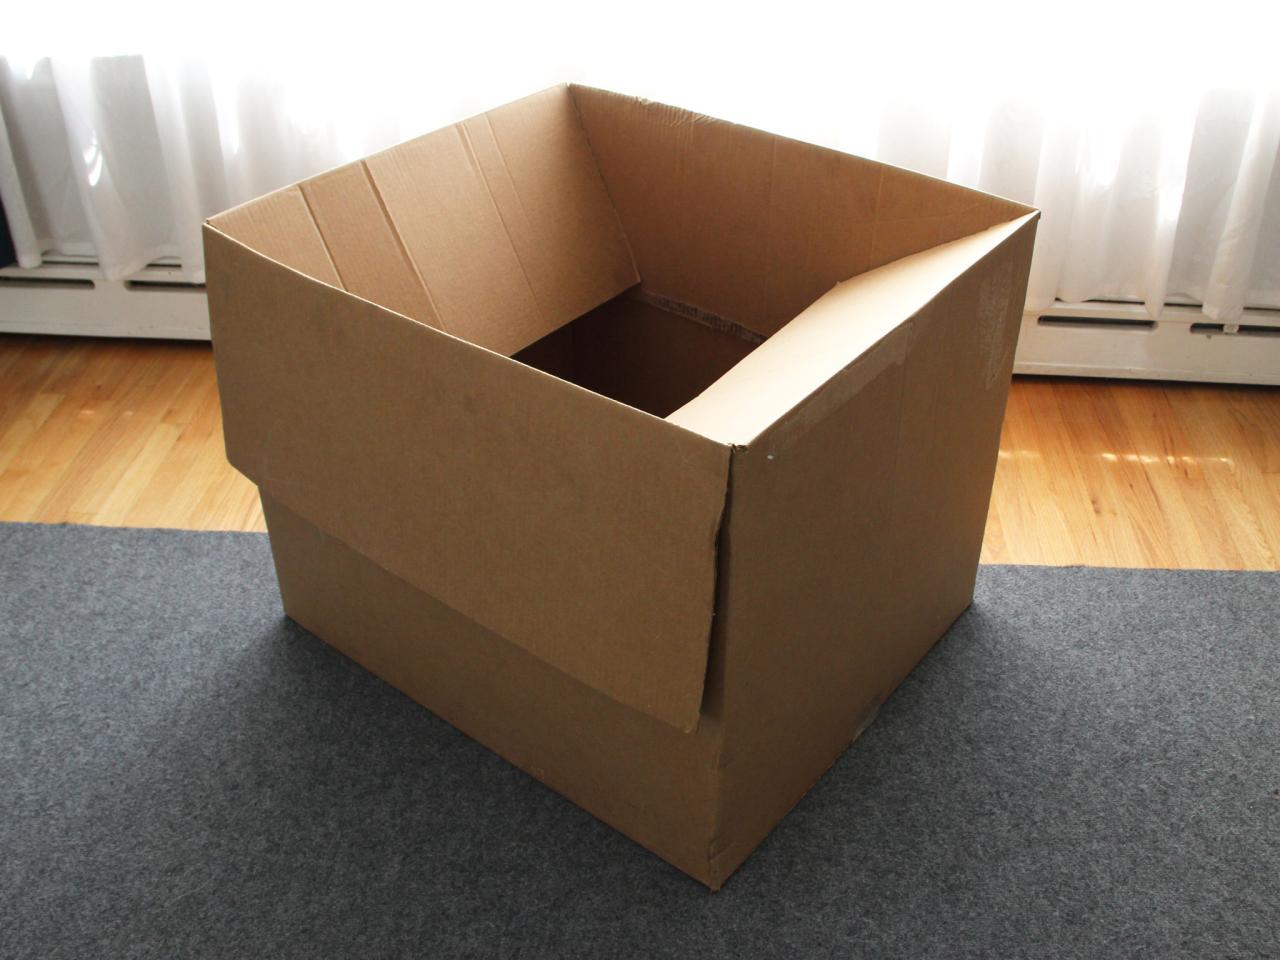 How to make a weatherproof cardboard box fort diy for Box blueprint maker